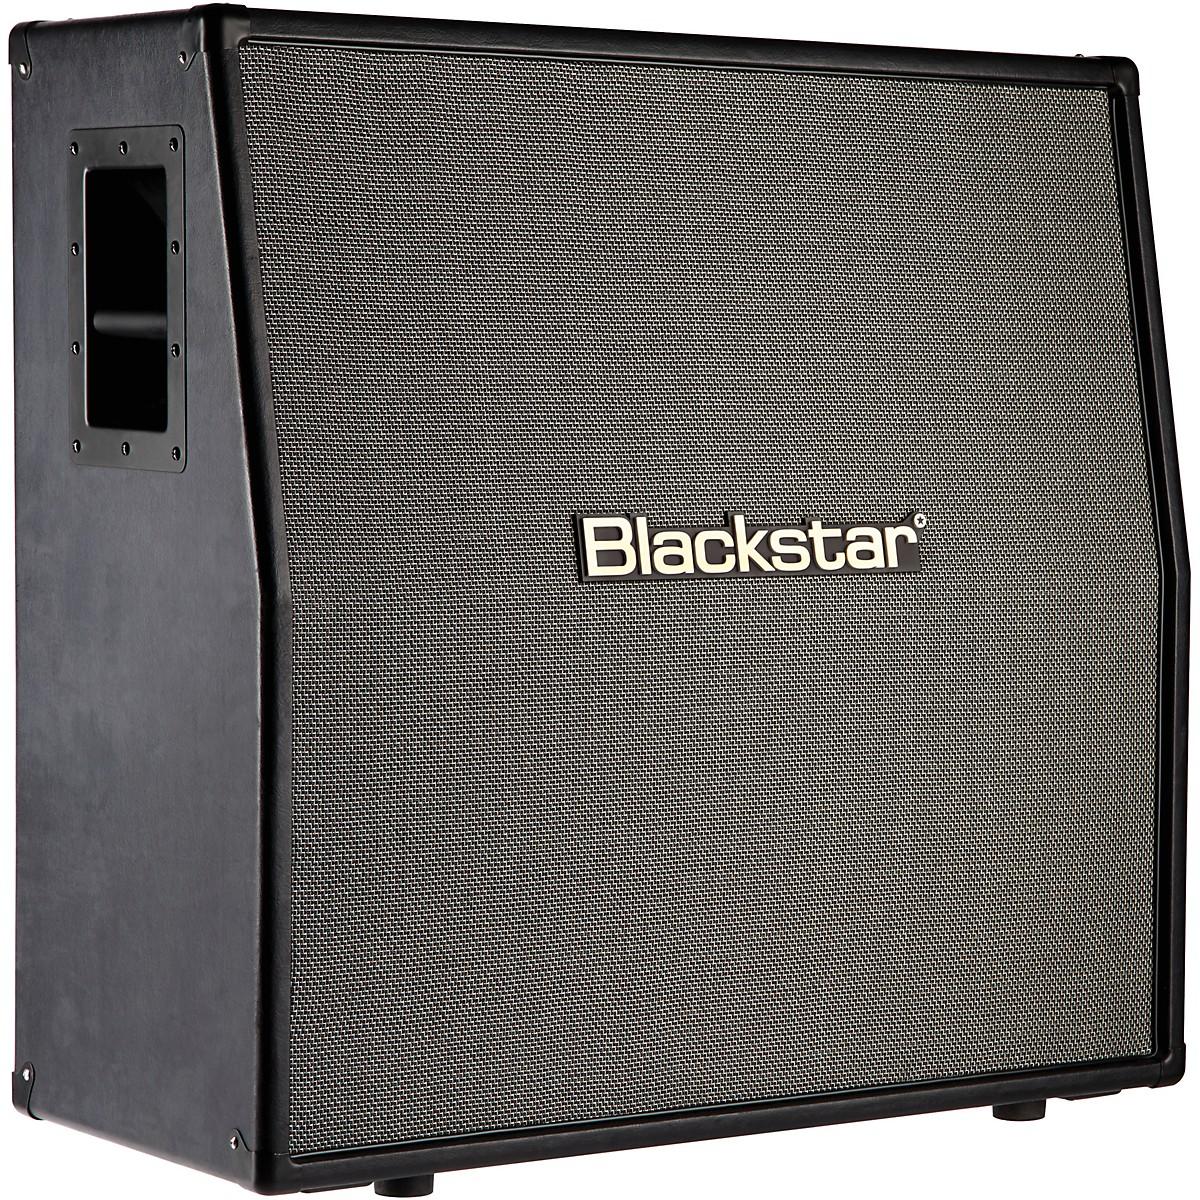 Blackstar HTV412B MKII HT Venue Series 320W 4x12 Straight Guitar Speaker Cabinet